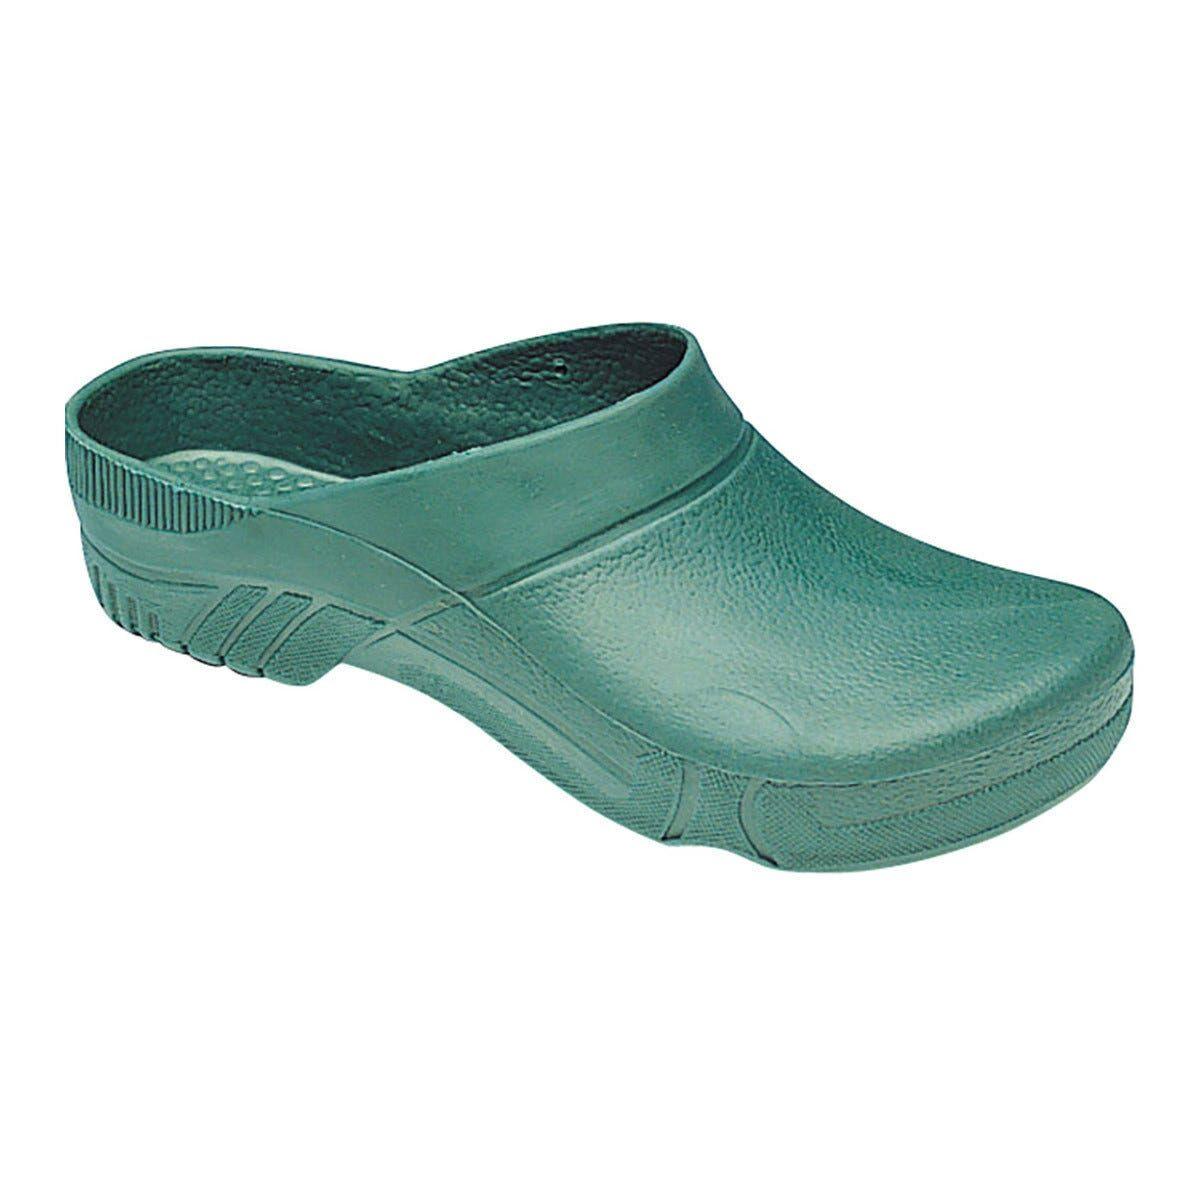 Zoccolo Giardino Pvc Misura 43 - 44 Verde Boots Company